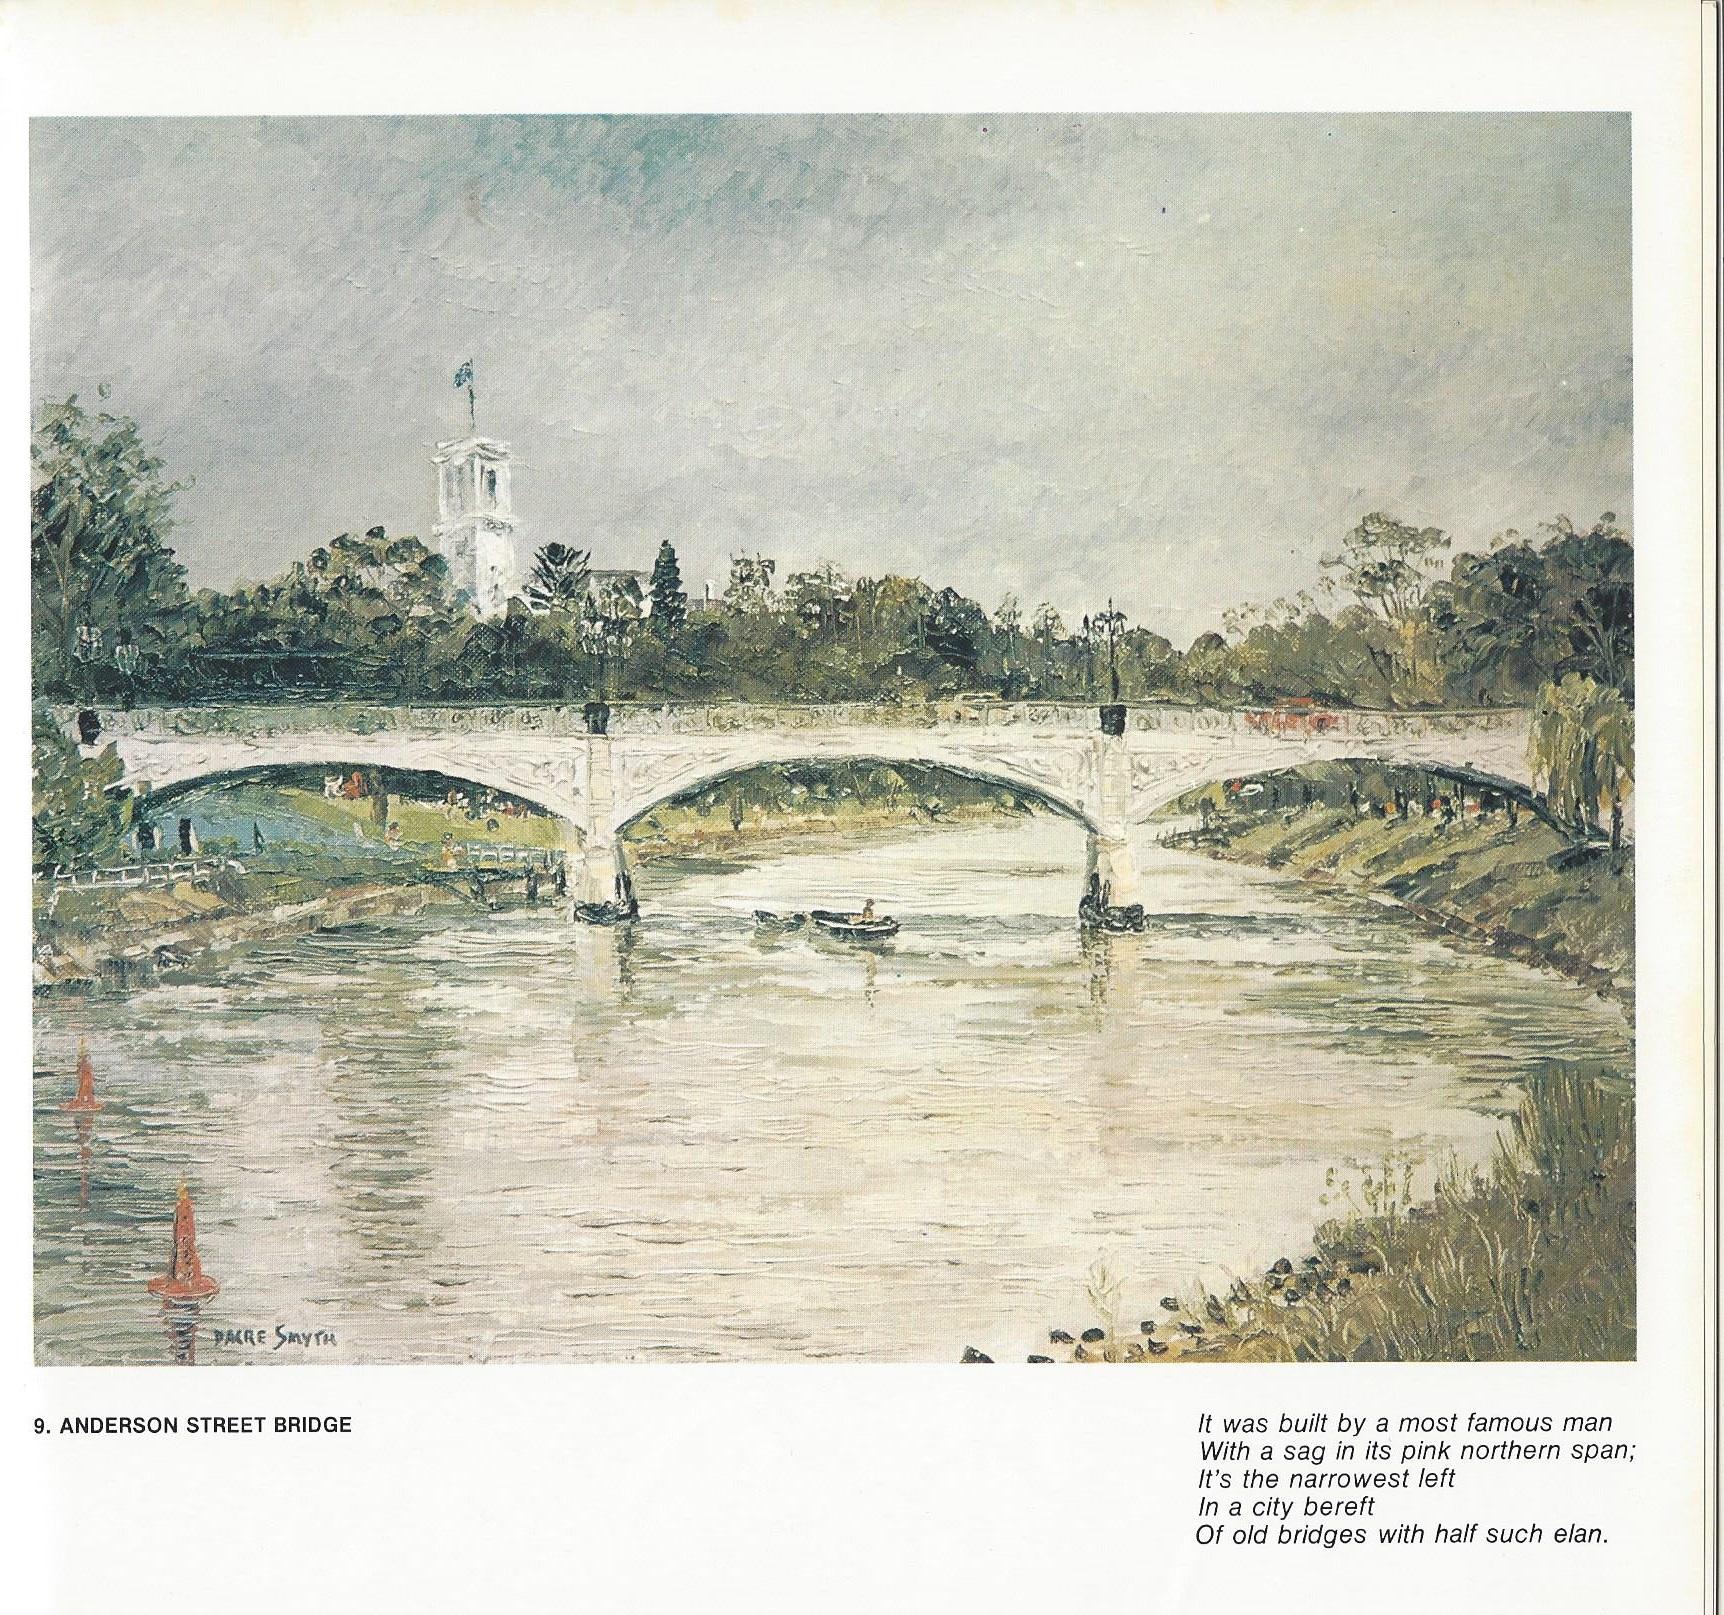 9. Anderson Street Bridge